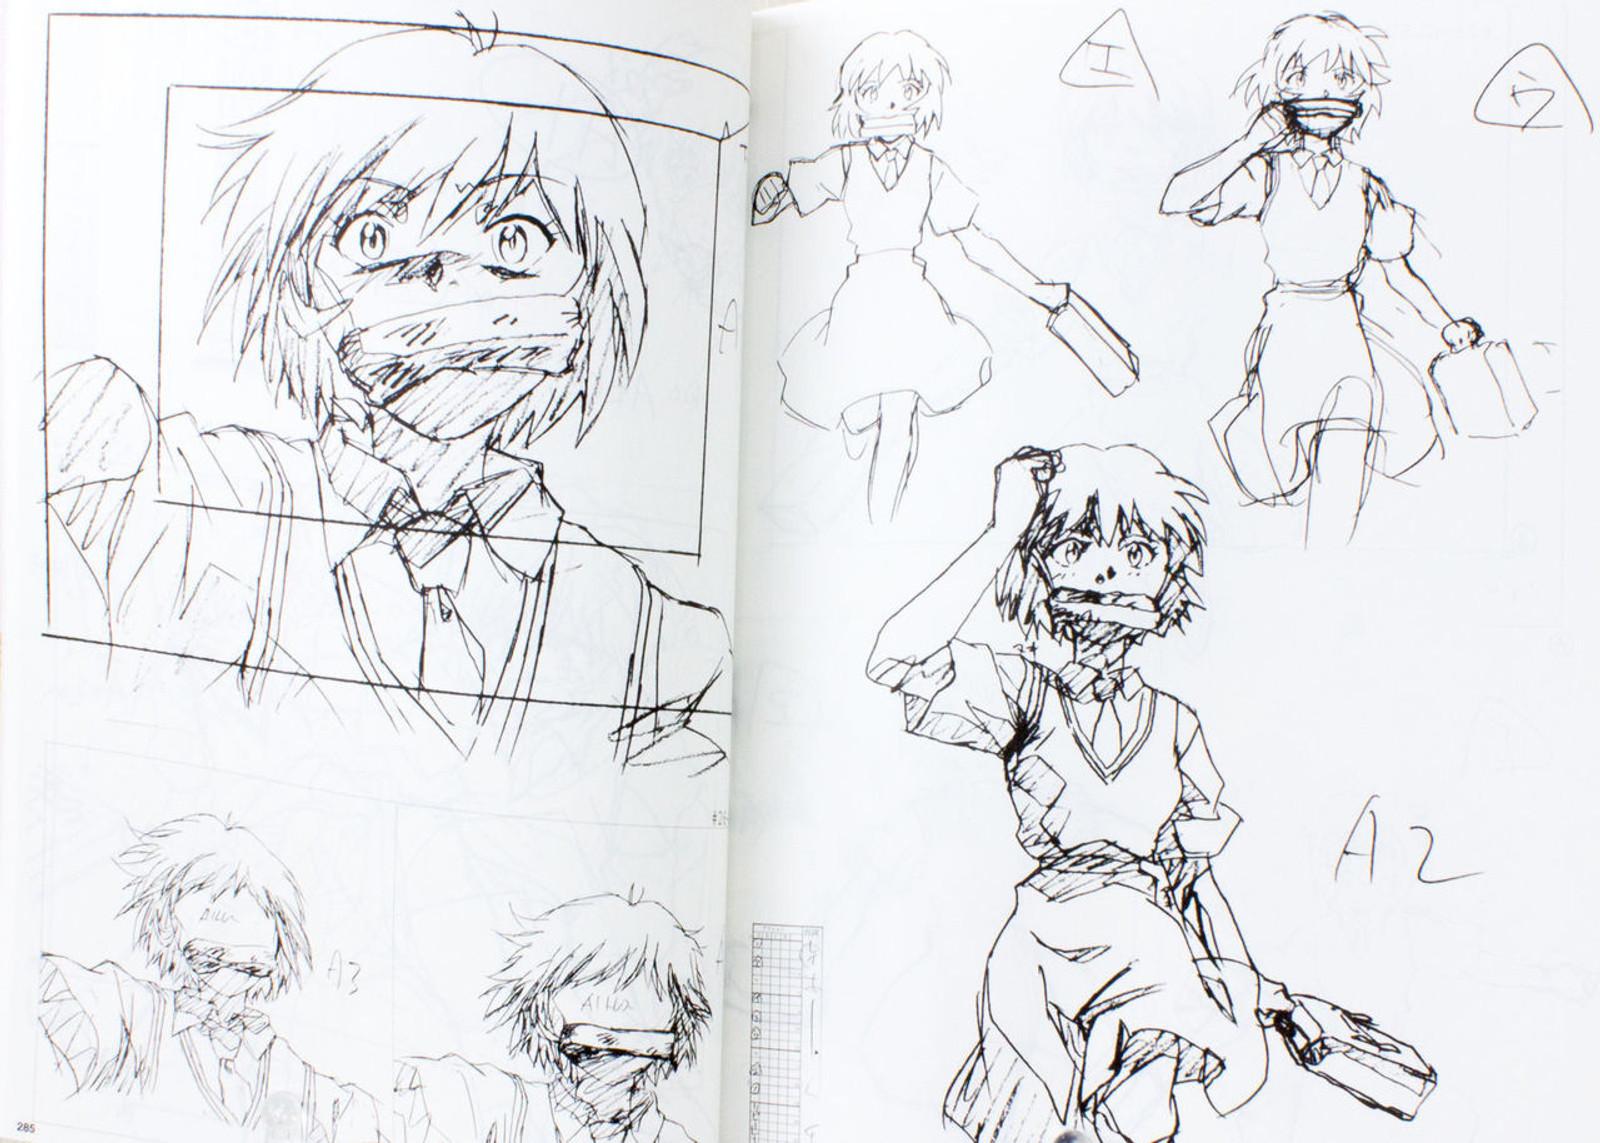 Evangelion REI no Himitsu illustration art book